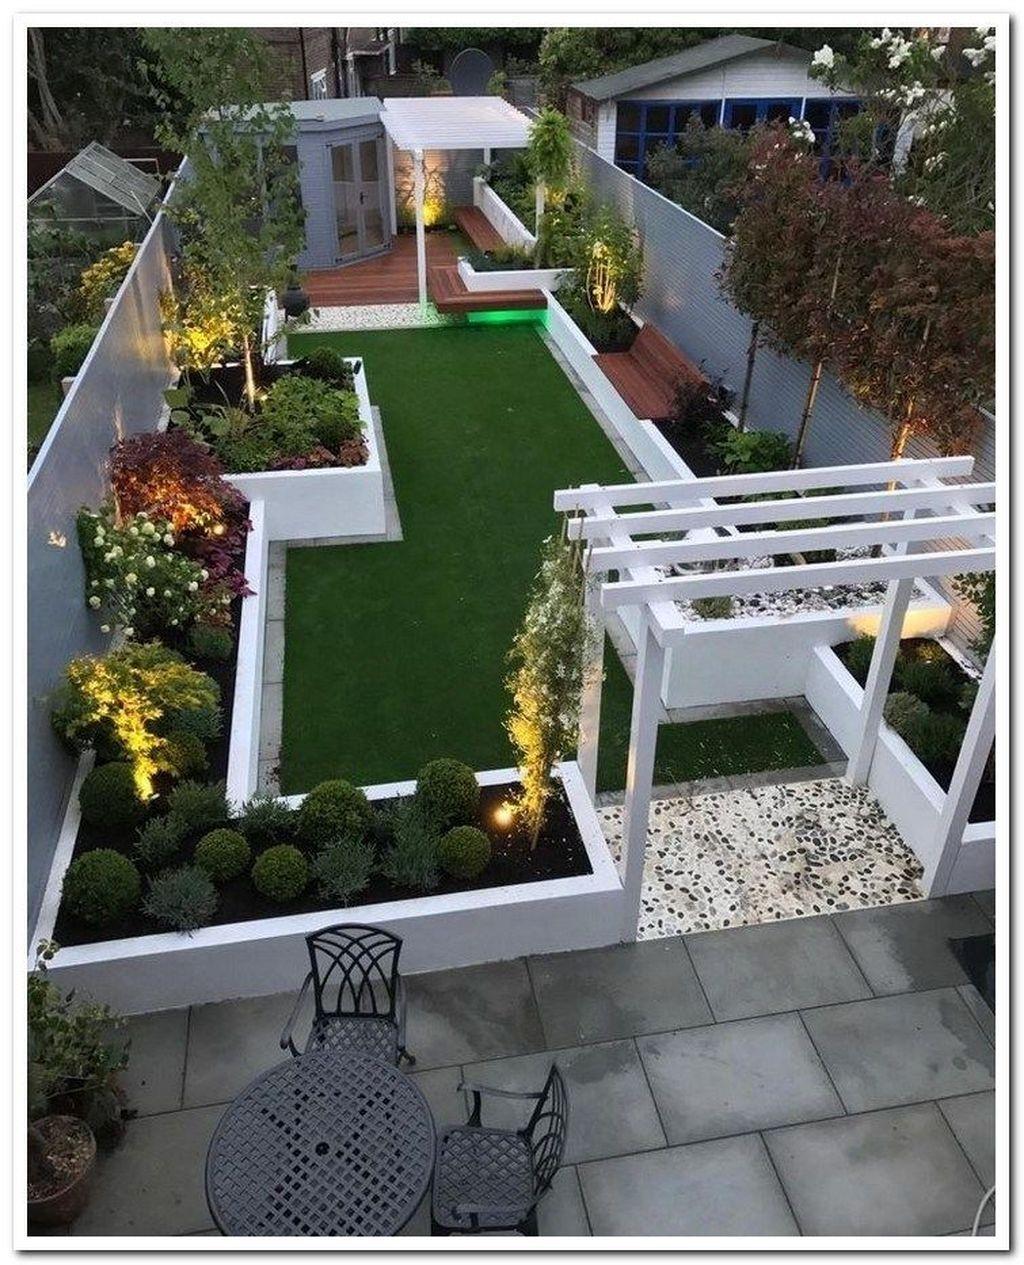 30 Popular Diy Backyard Projects Ideas For Your Pets Home Garden Design Small Backyard Landscaping Backyard